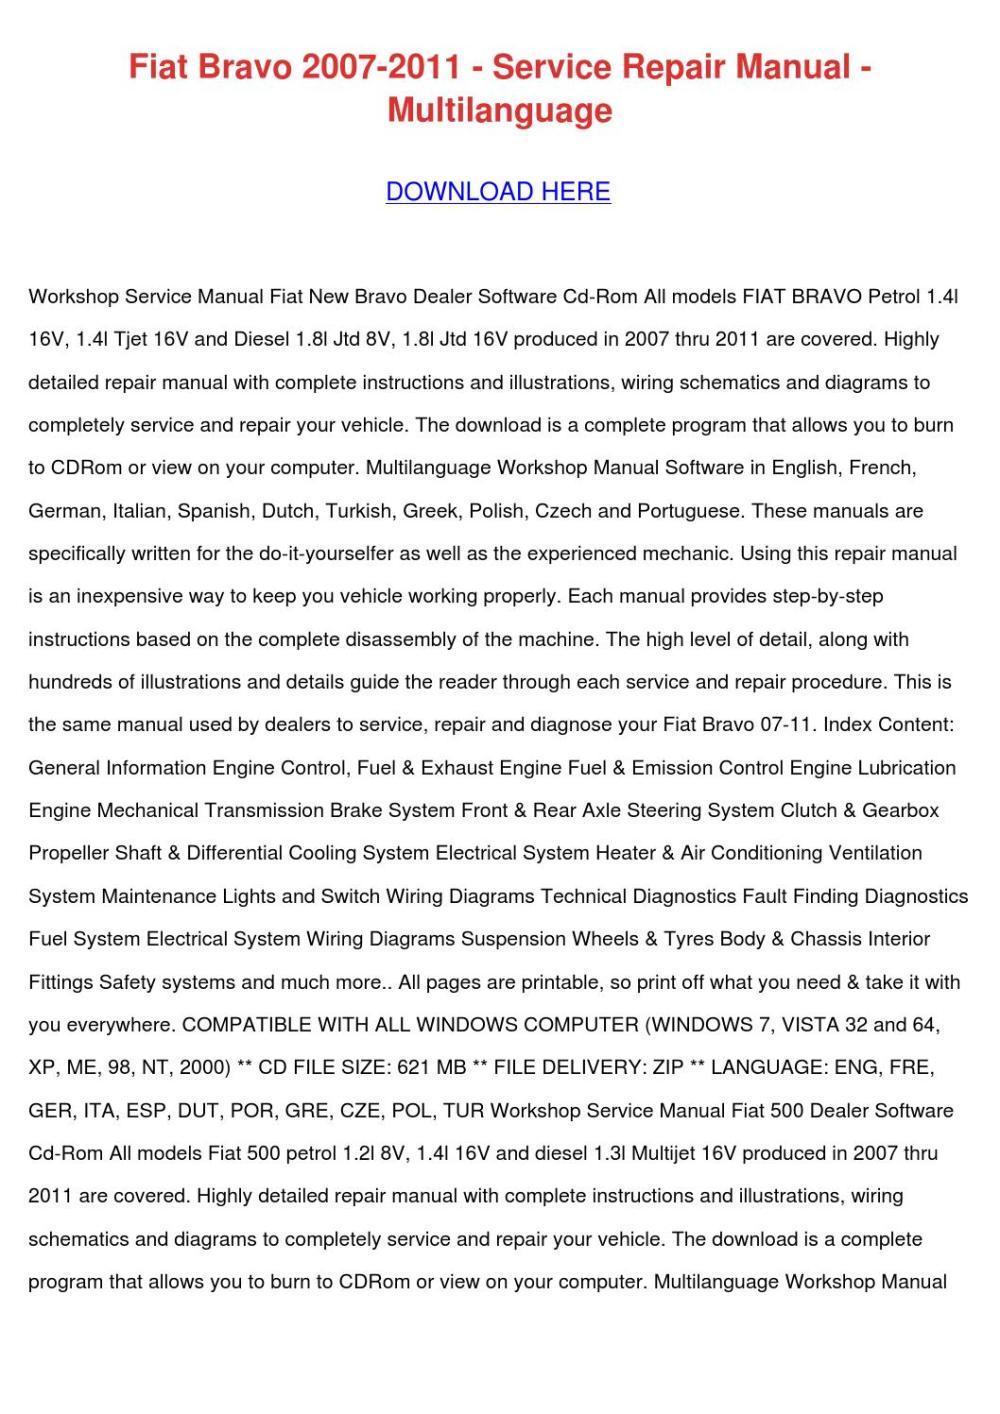 medium resolution of 2012 polari ranger diesel wiring diagram